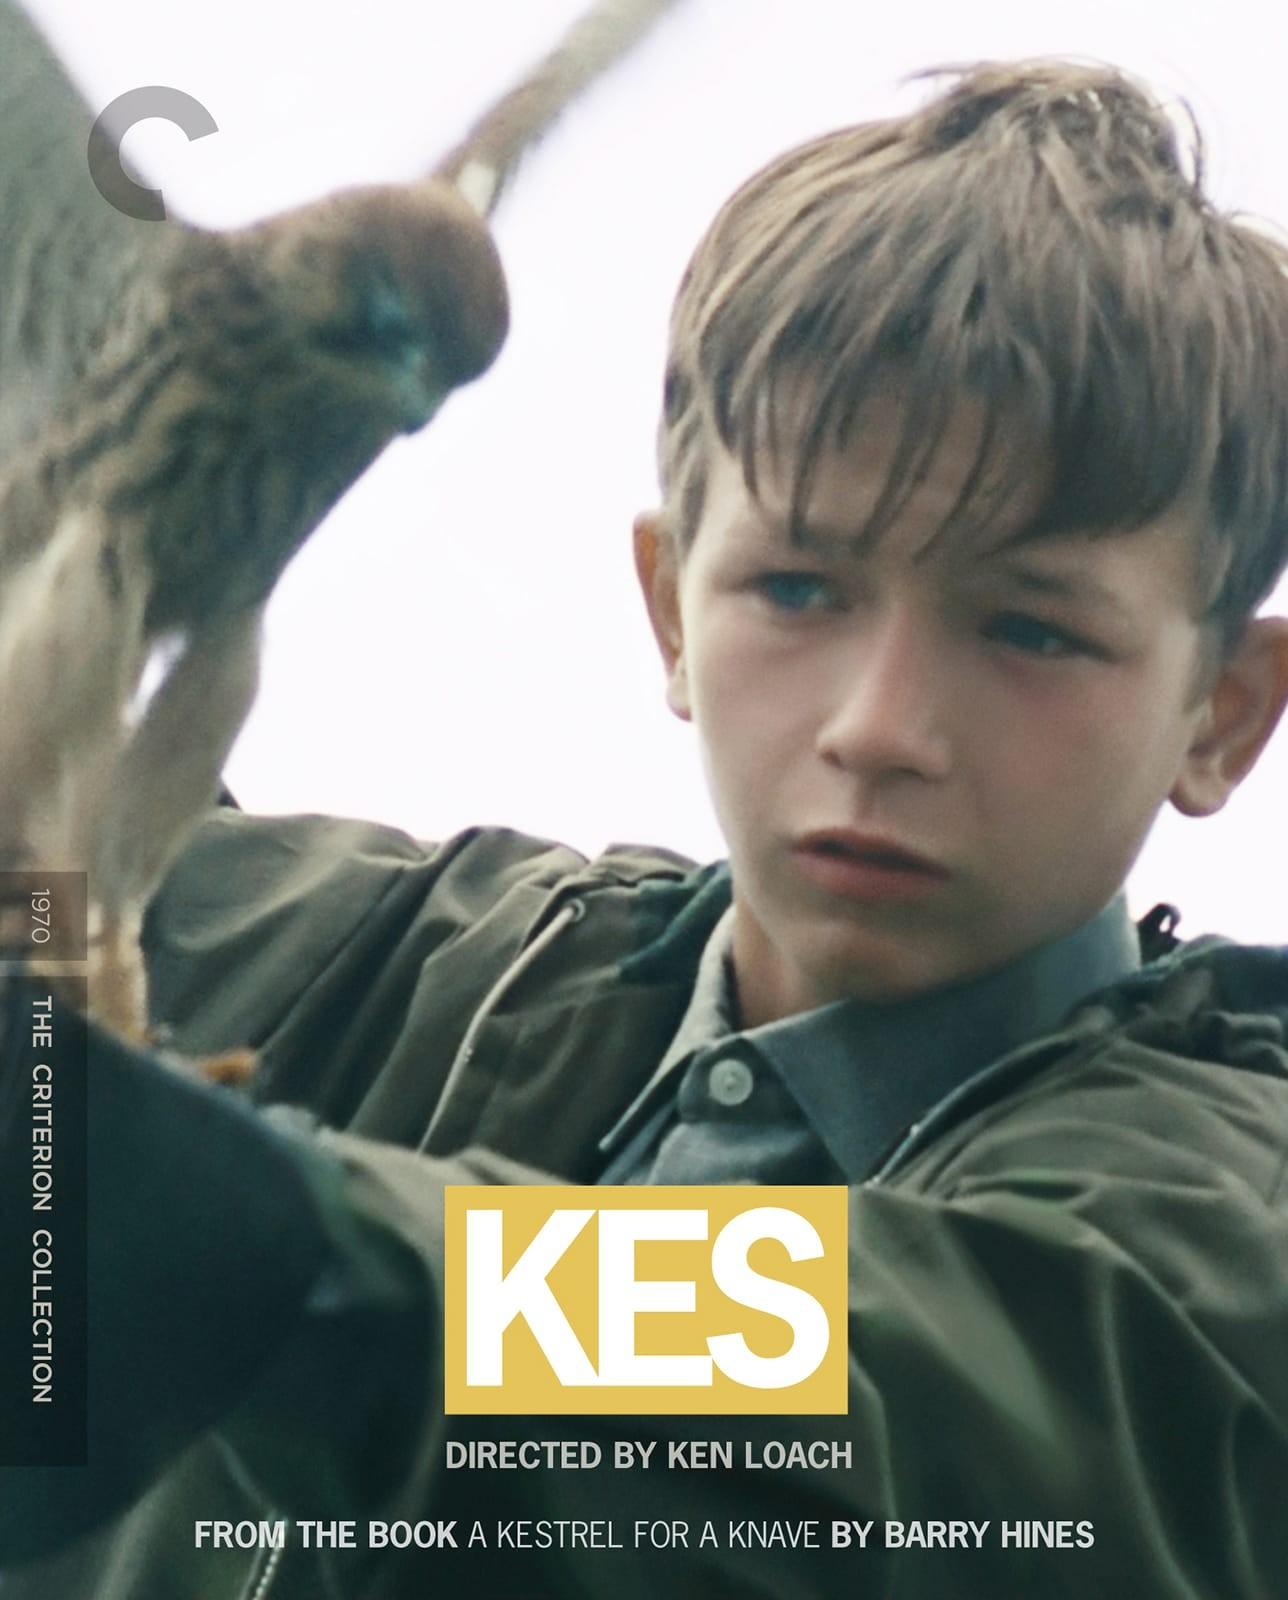 a kestrel for a knave movie